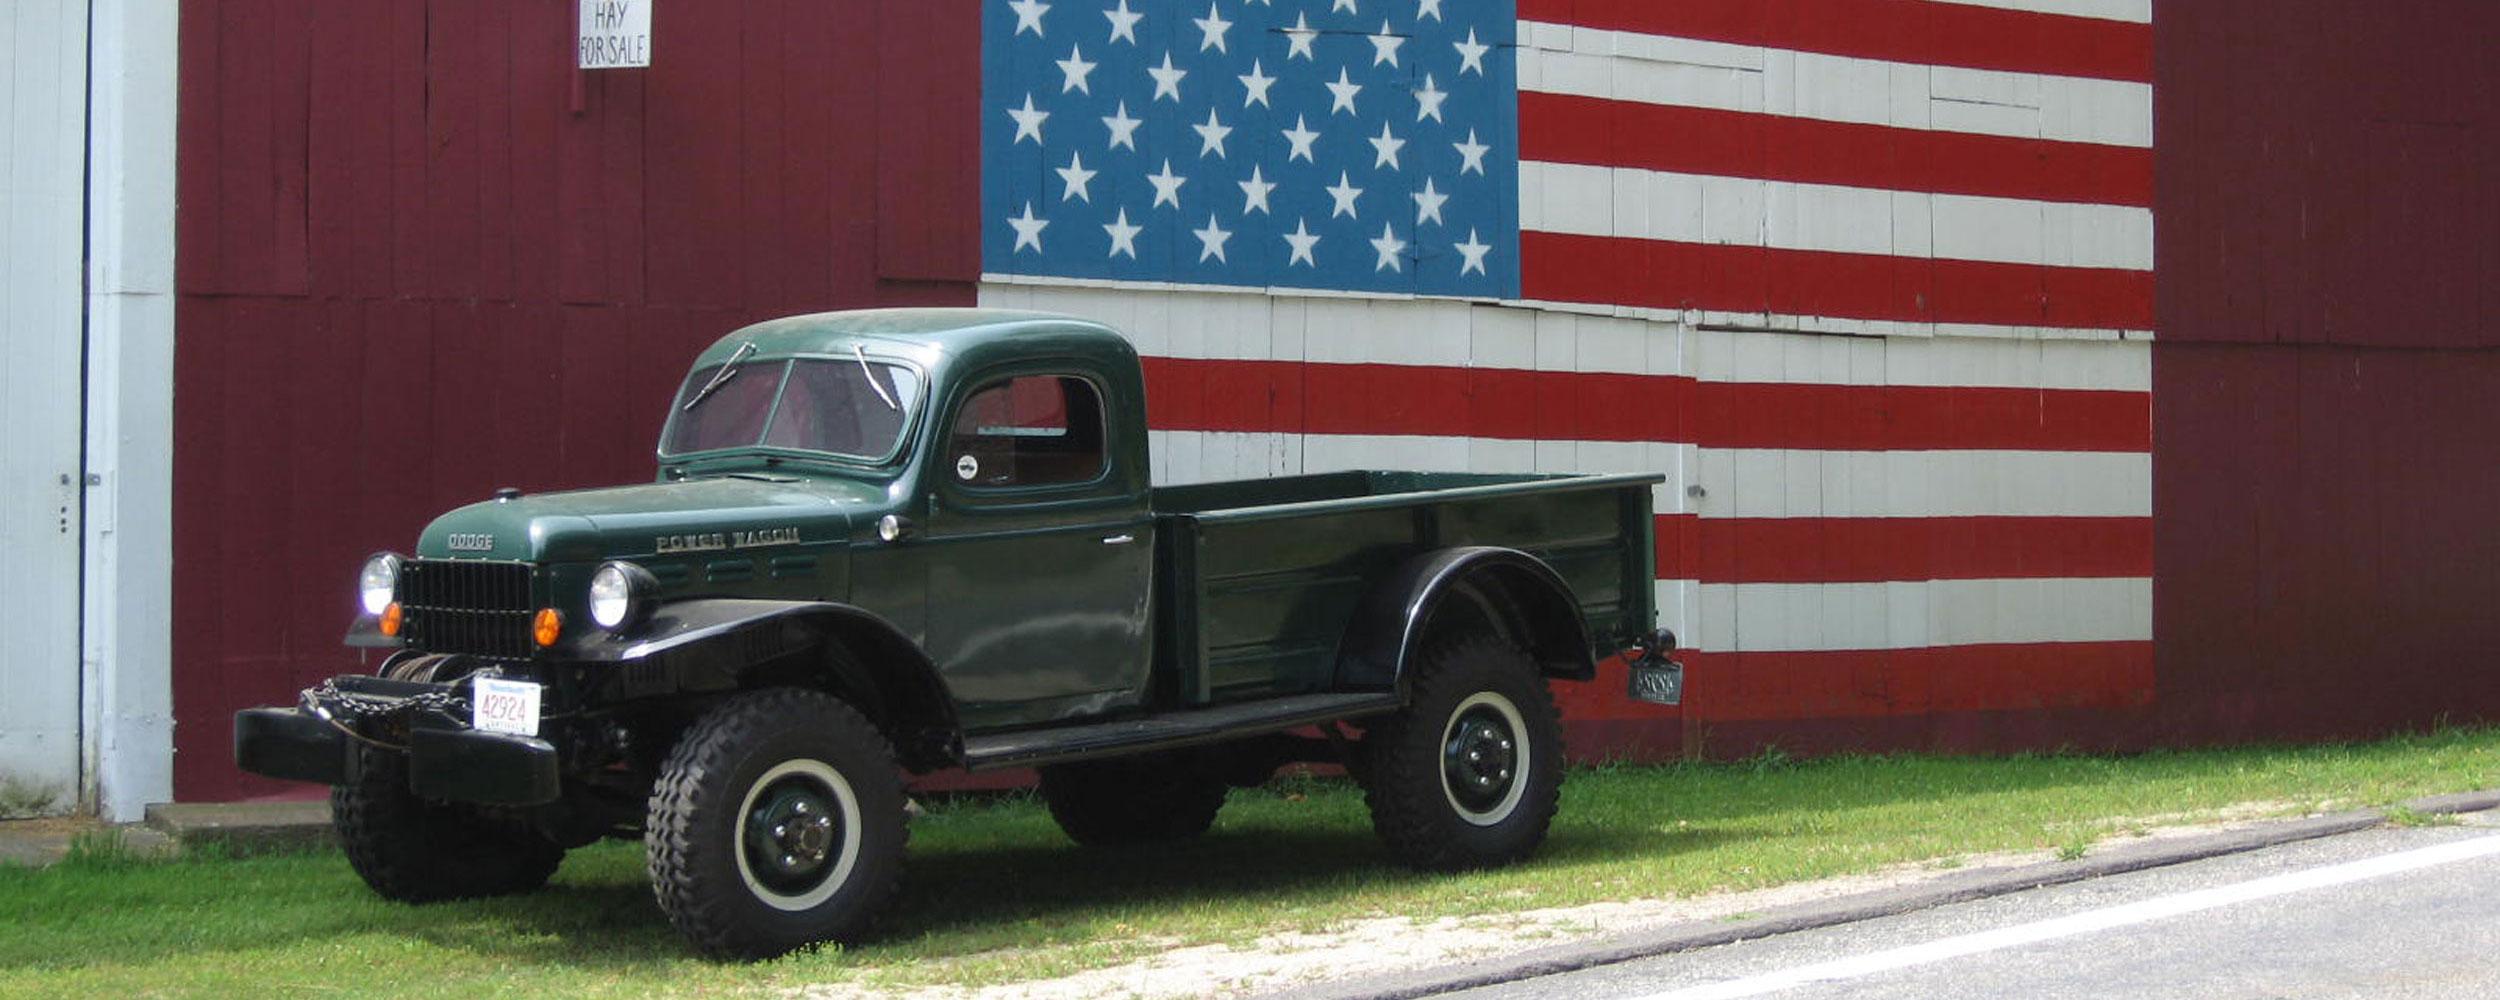 Power Wagon Page 1949 Dodge Joe Cimoch Webster Ma 1968 Wm300